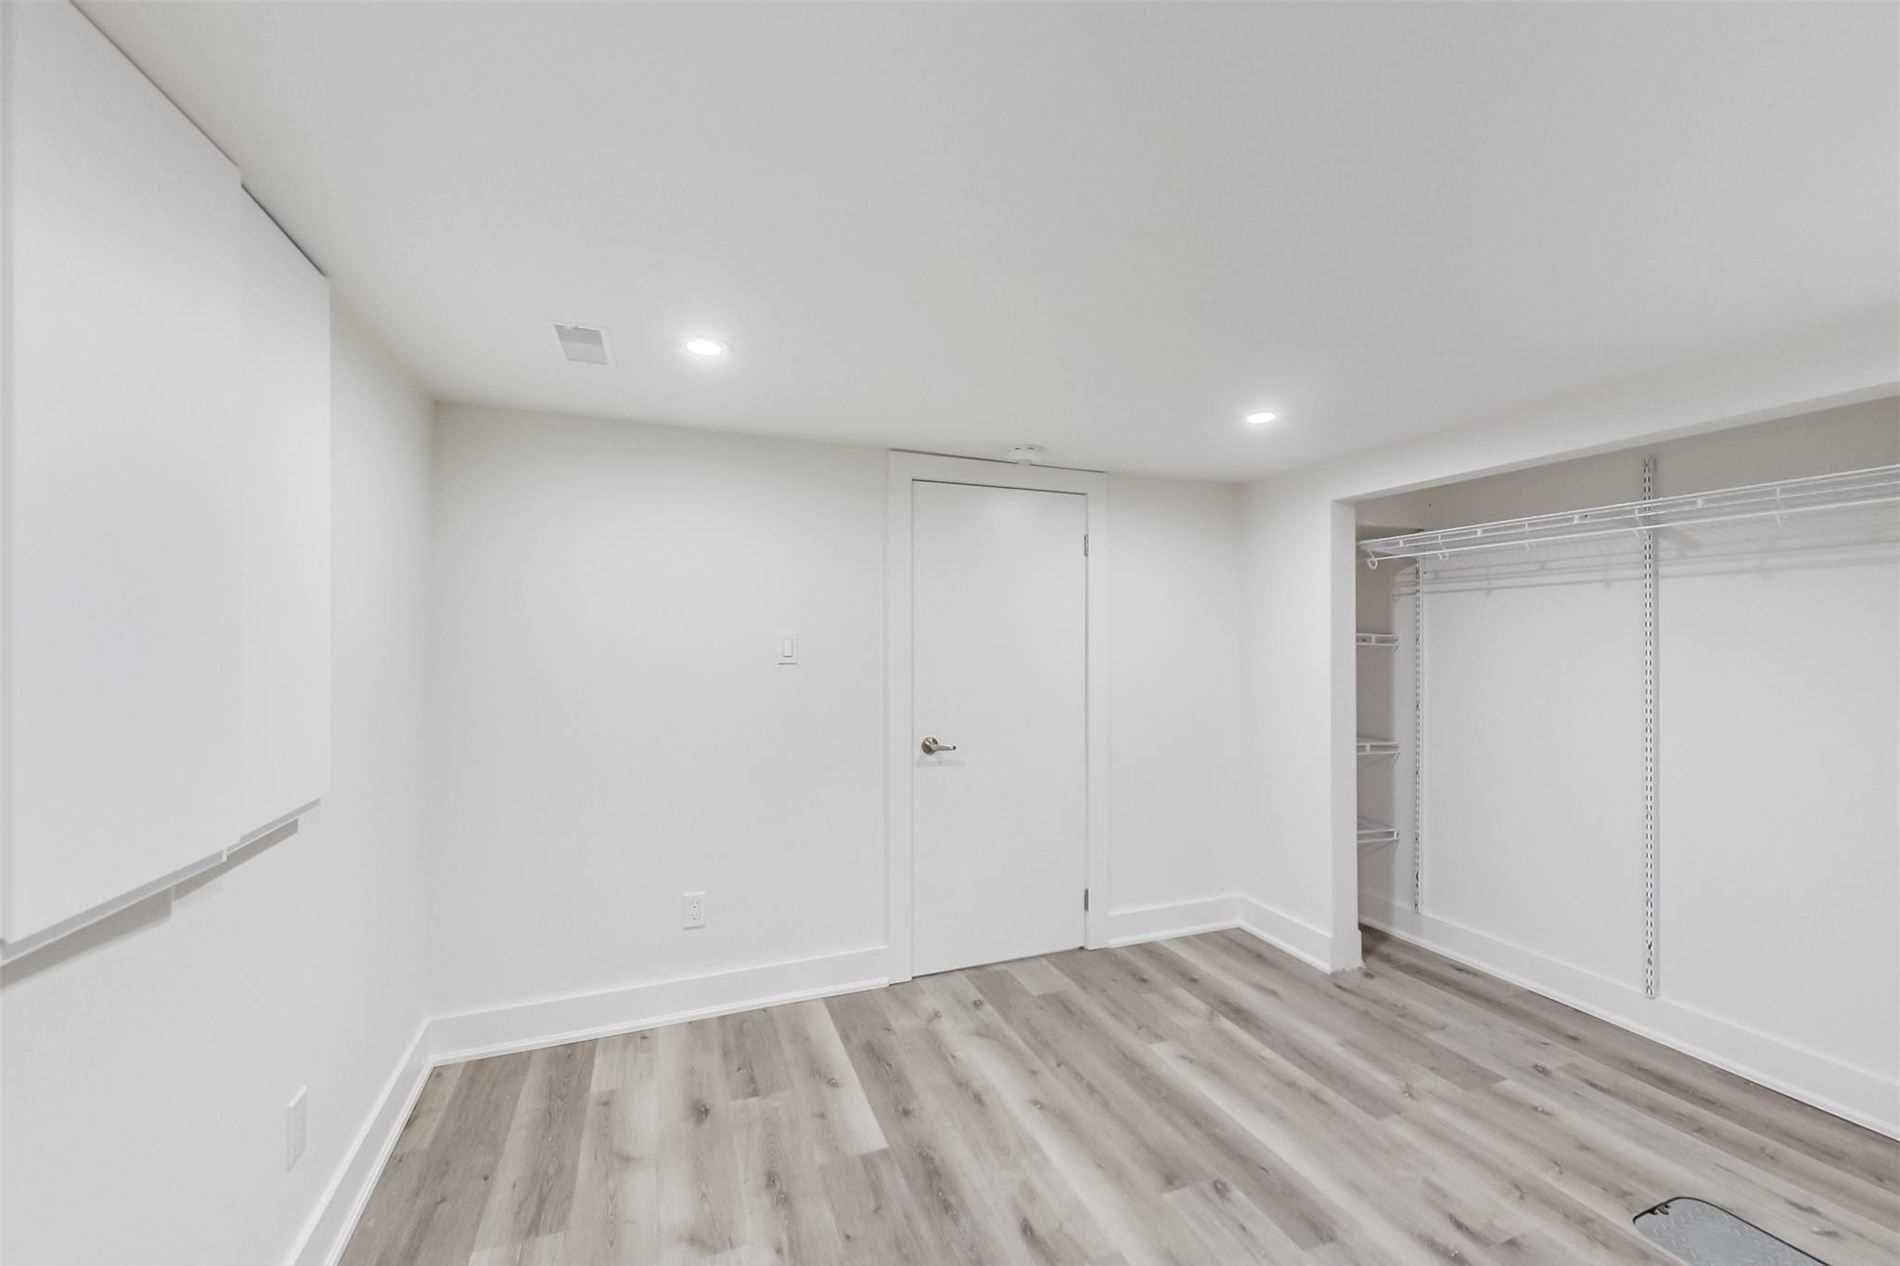 Photo 13: Photos: 501B Carlaw Avenue in Toronto: South Riverdale House (2 1/2 Storey) for lease (Toronto E01)  : MLS®# E4800704